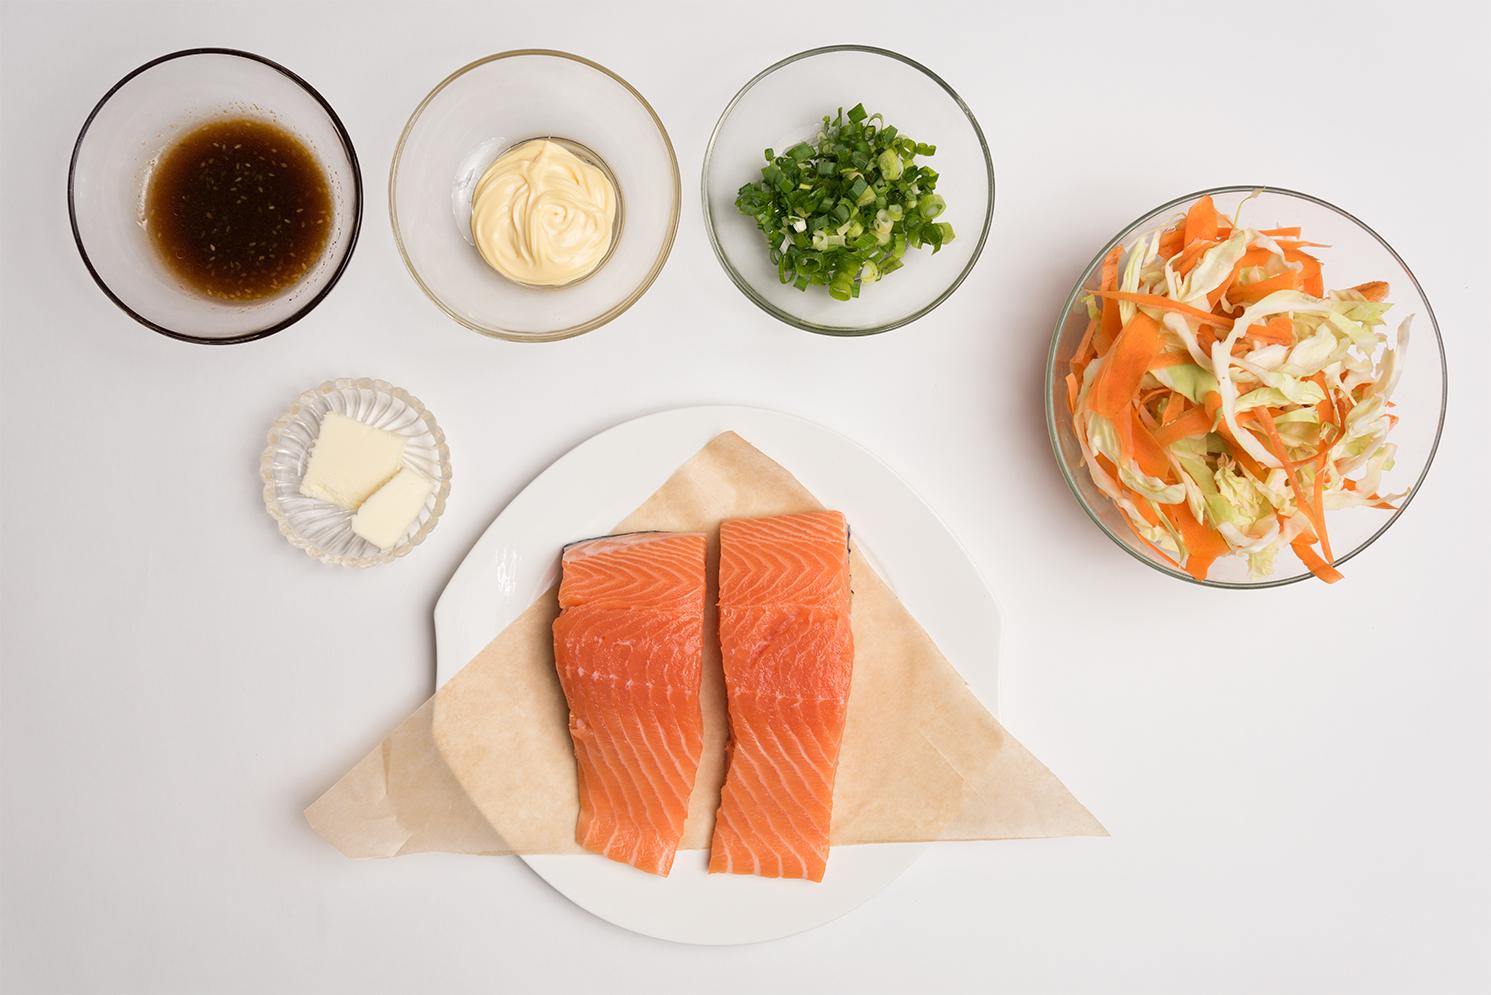 ROCK MAMA NYC LIFESTYLE BLOG - RECIPE - SUPER EASY FISH DISH